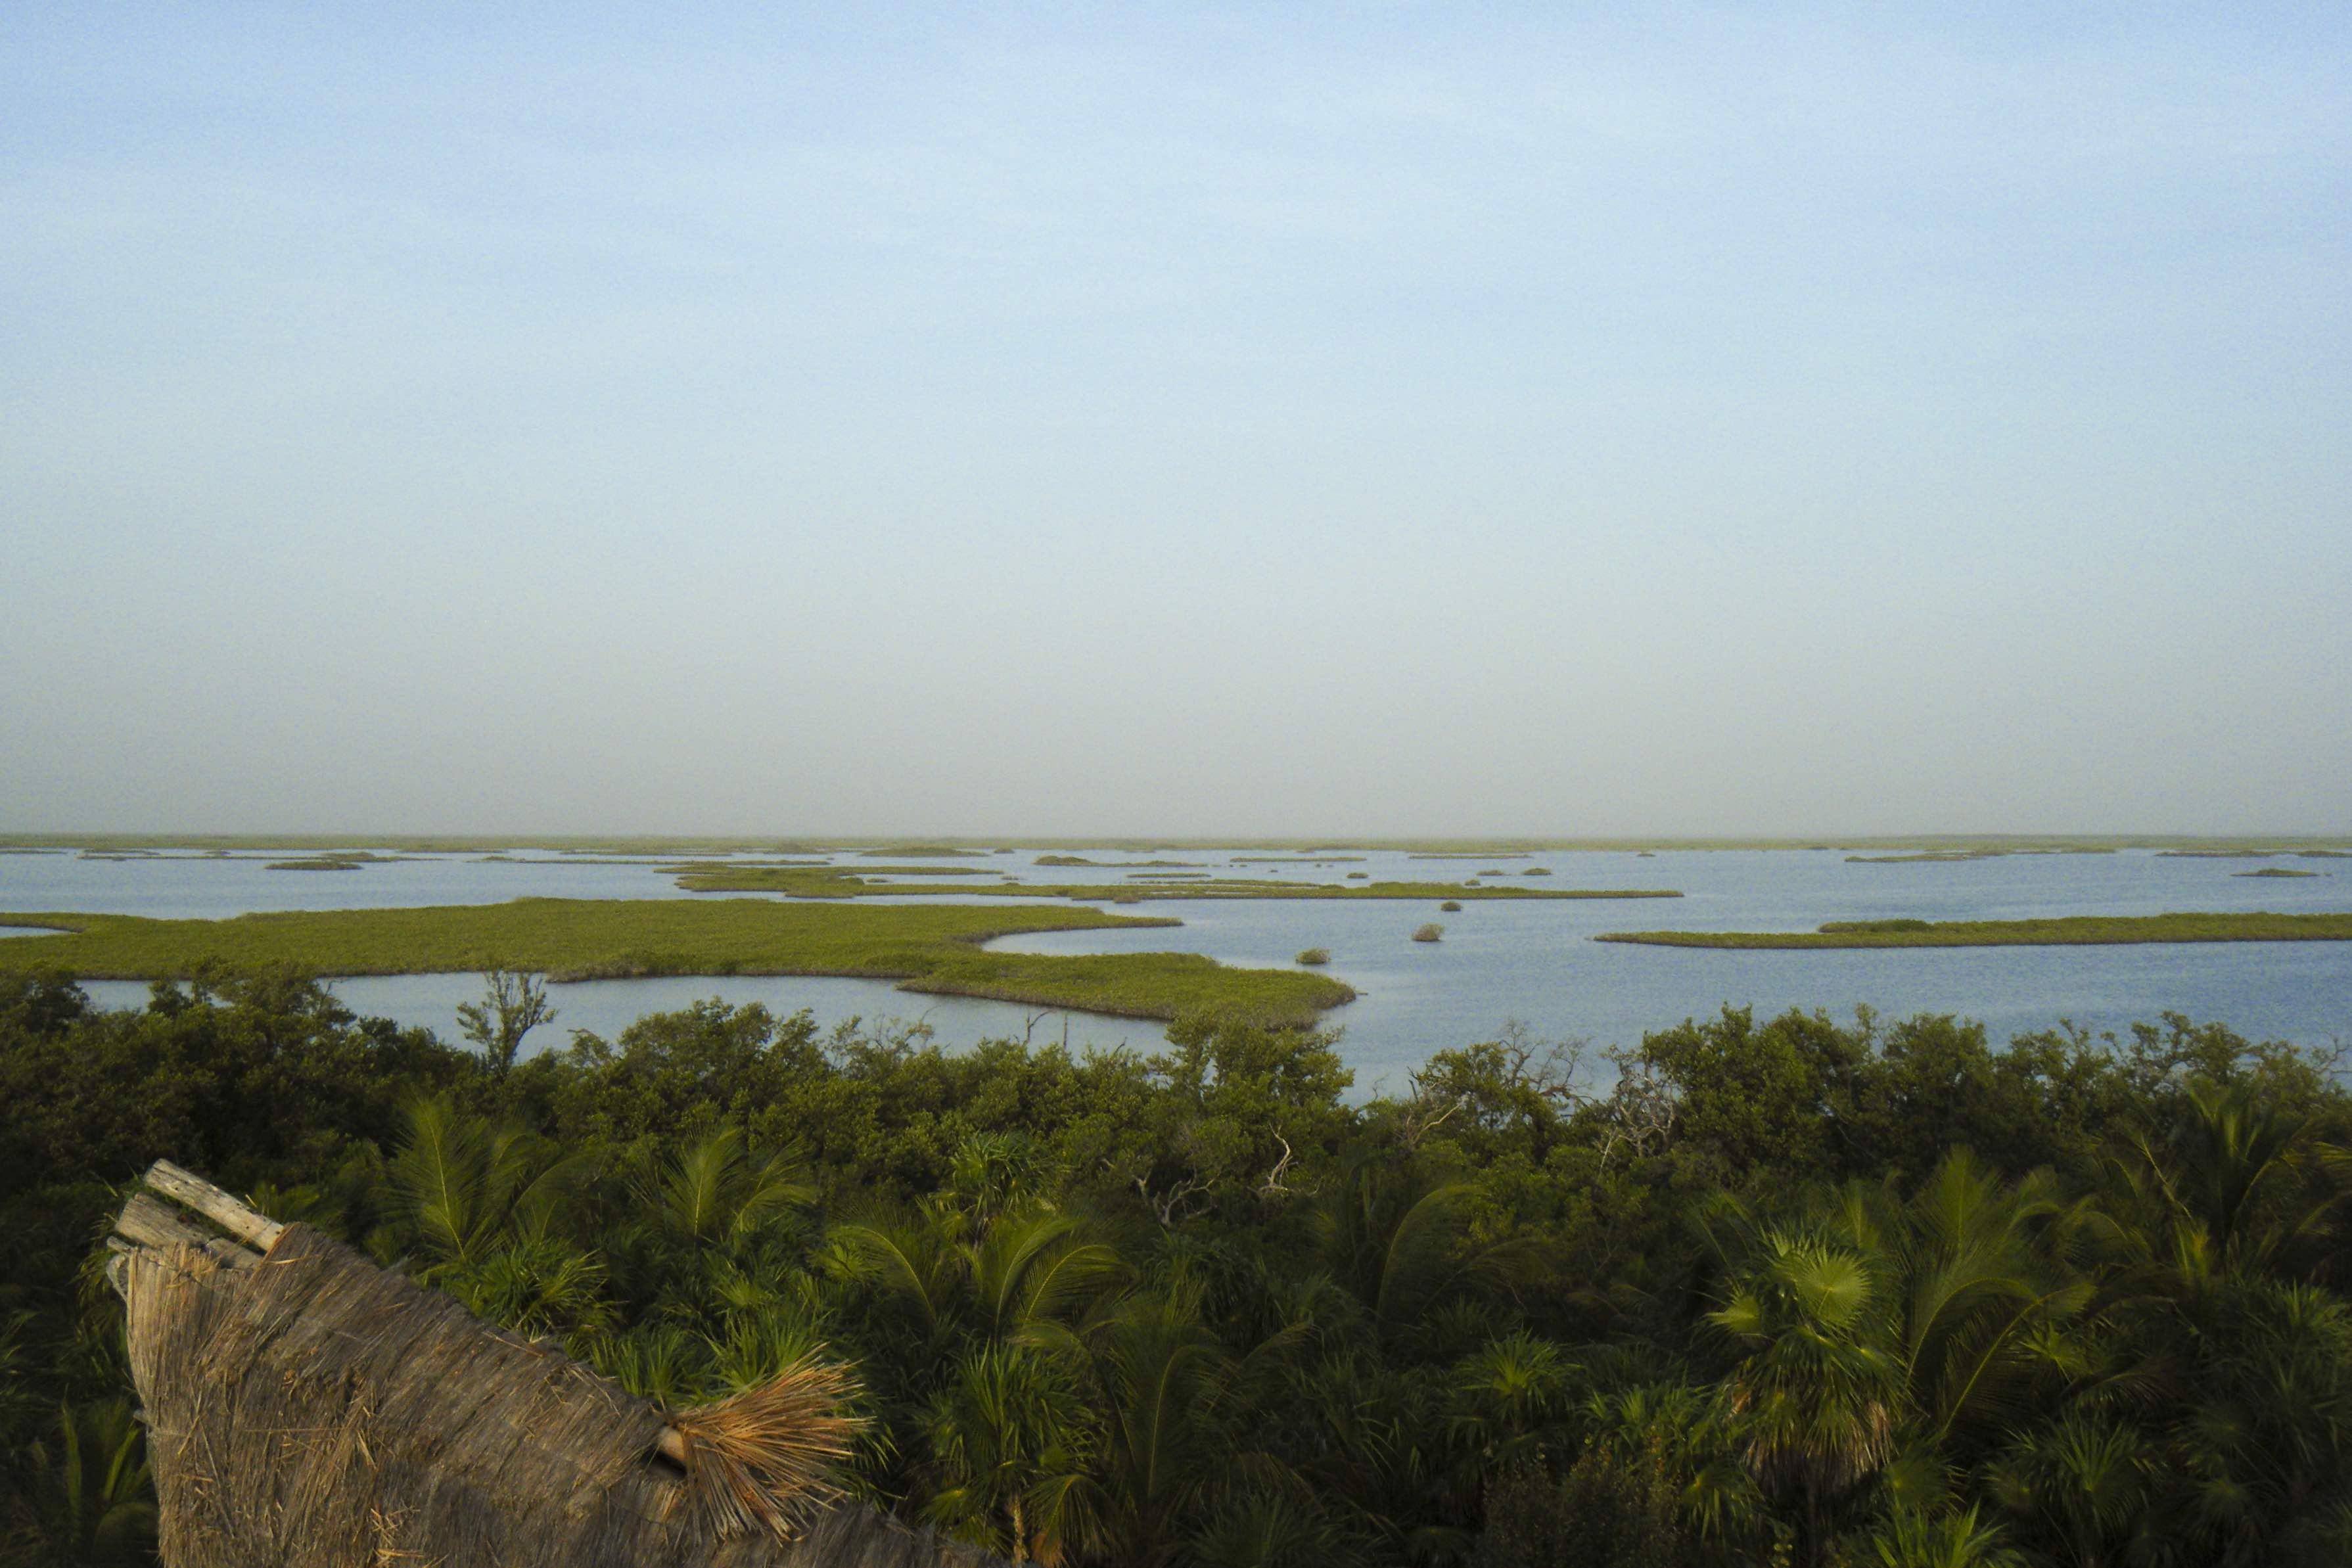 Reserva de la Biósfera Sian Ka'an